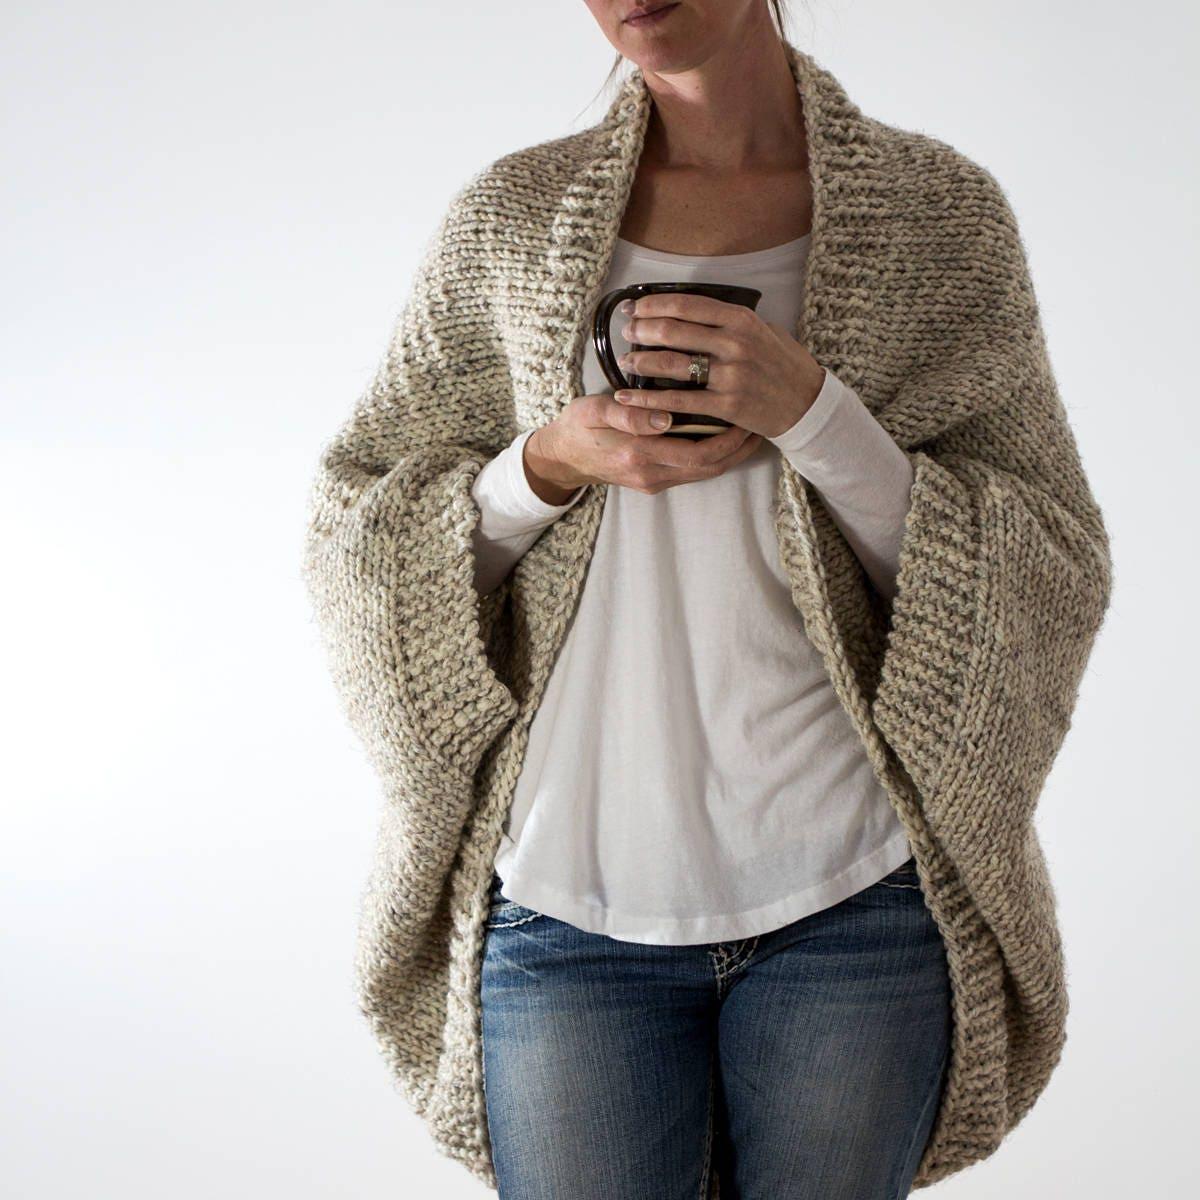 Knitting Pattern - Oversized Scoop Sweater - Knit Cardigan - Knit ...